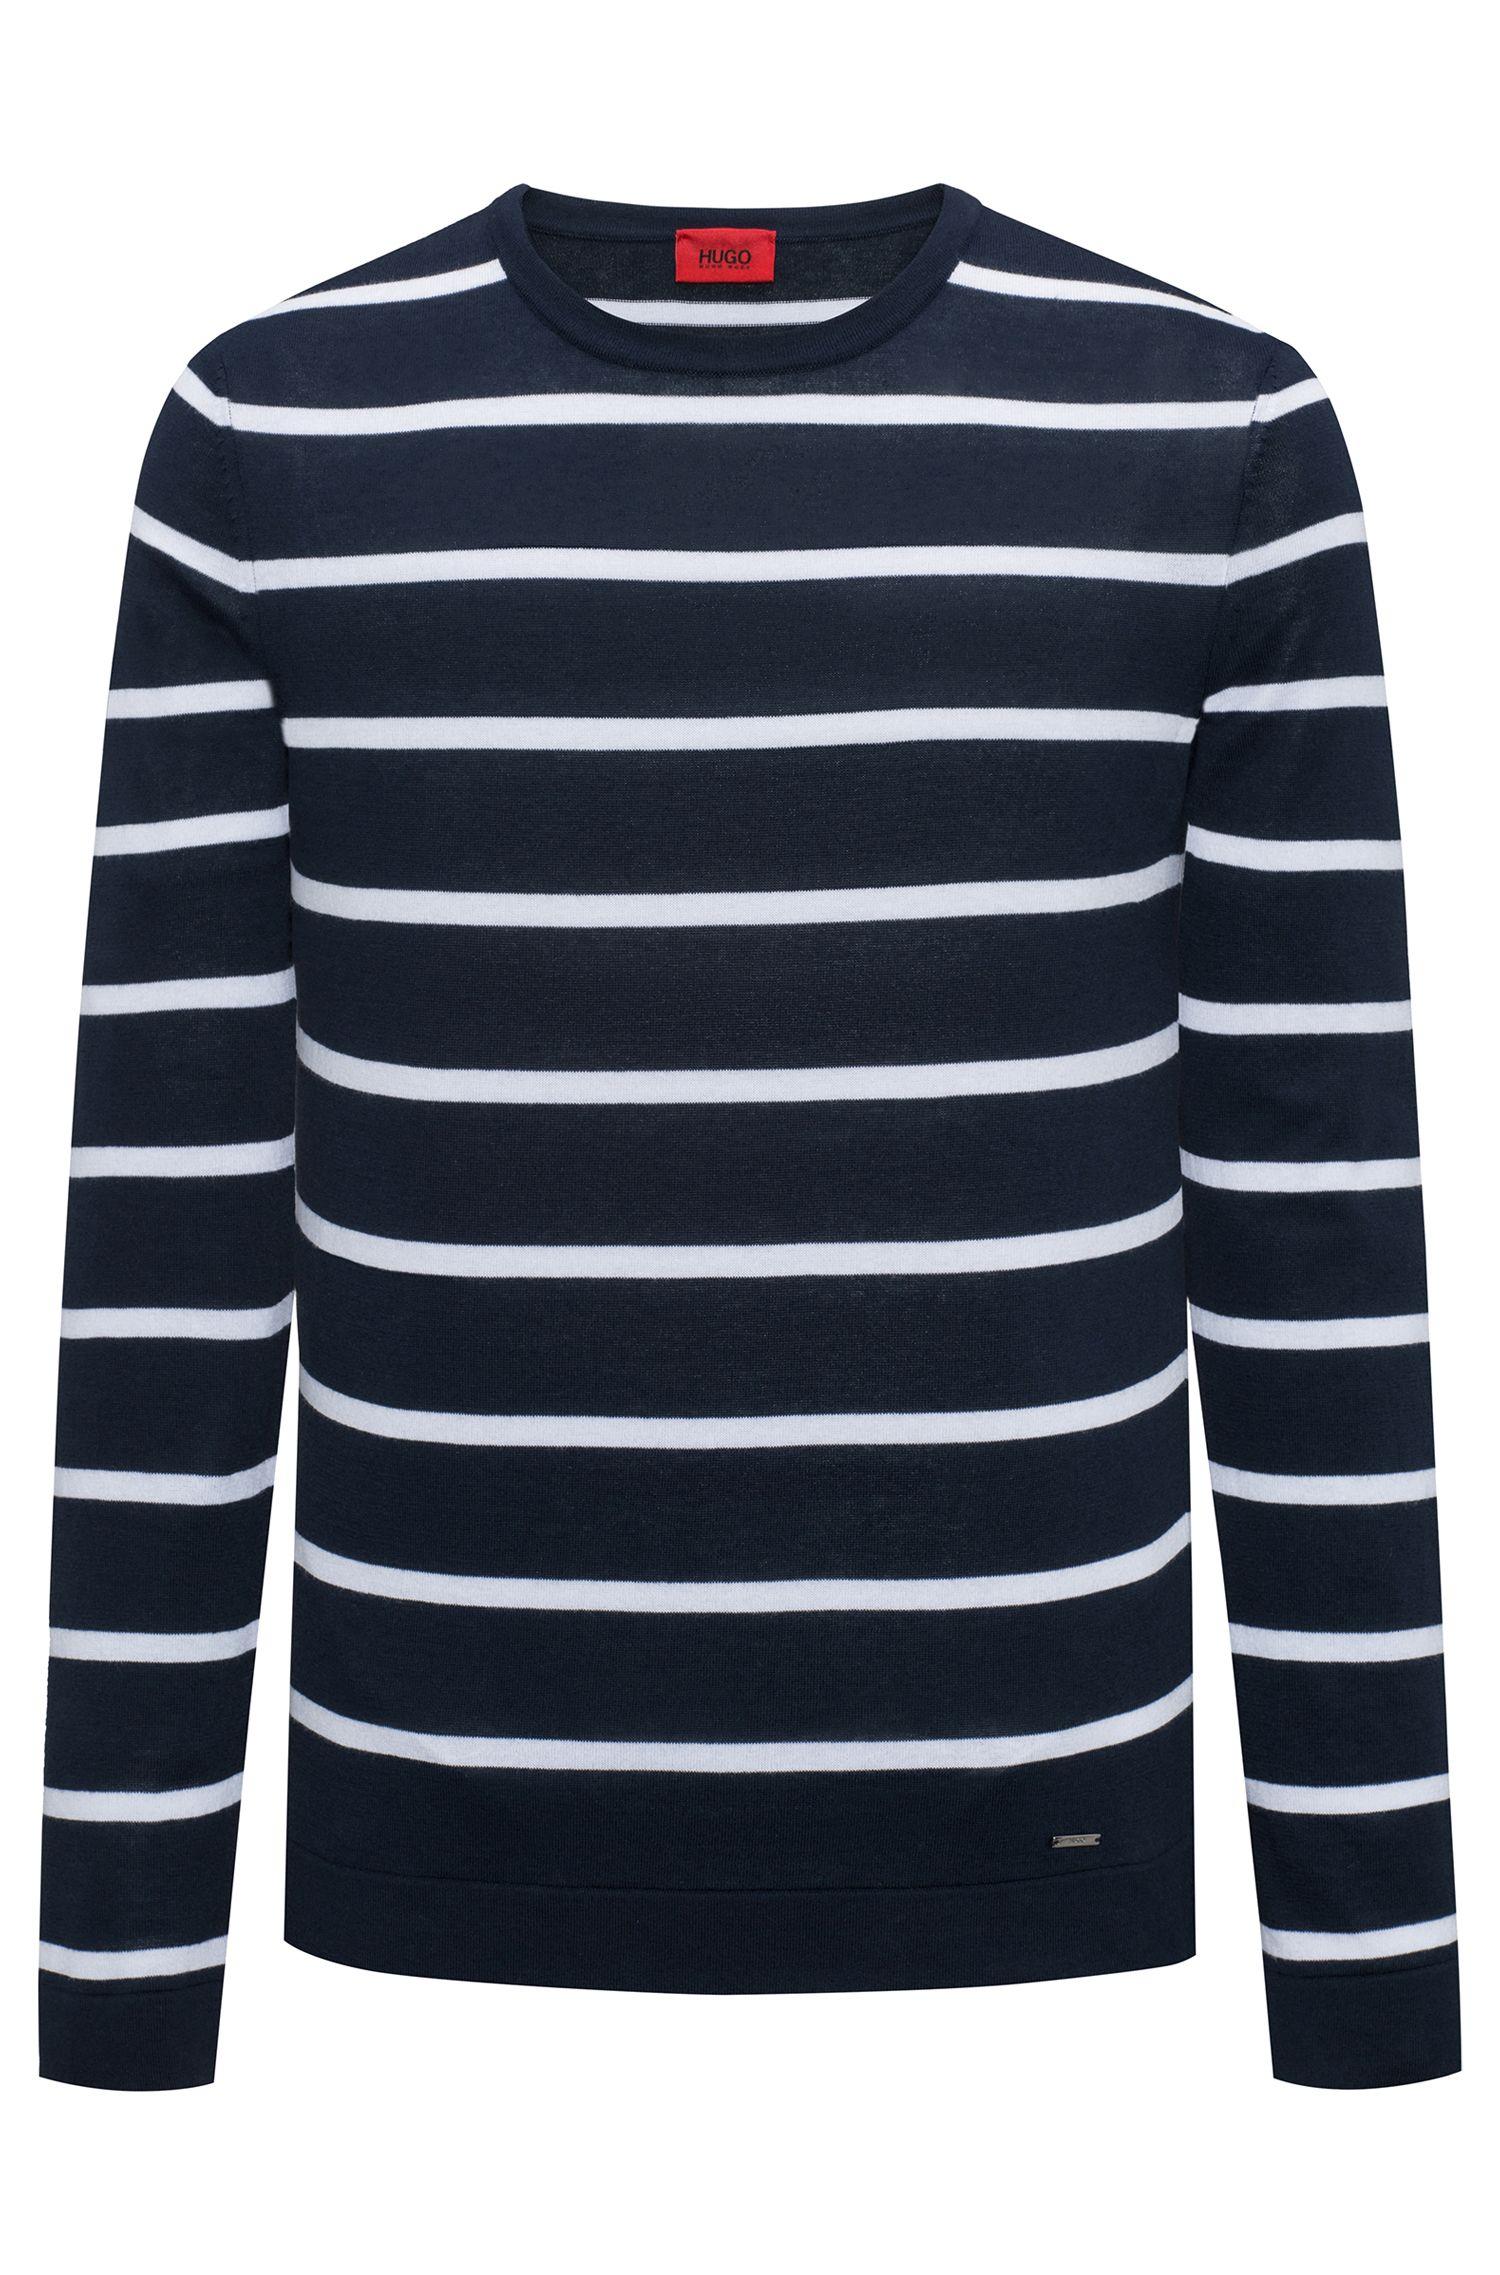 Striped sweater in lightweight cotton